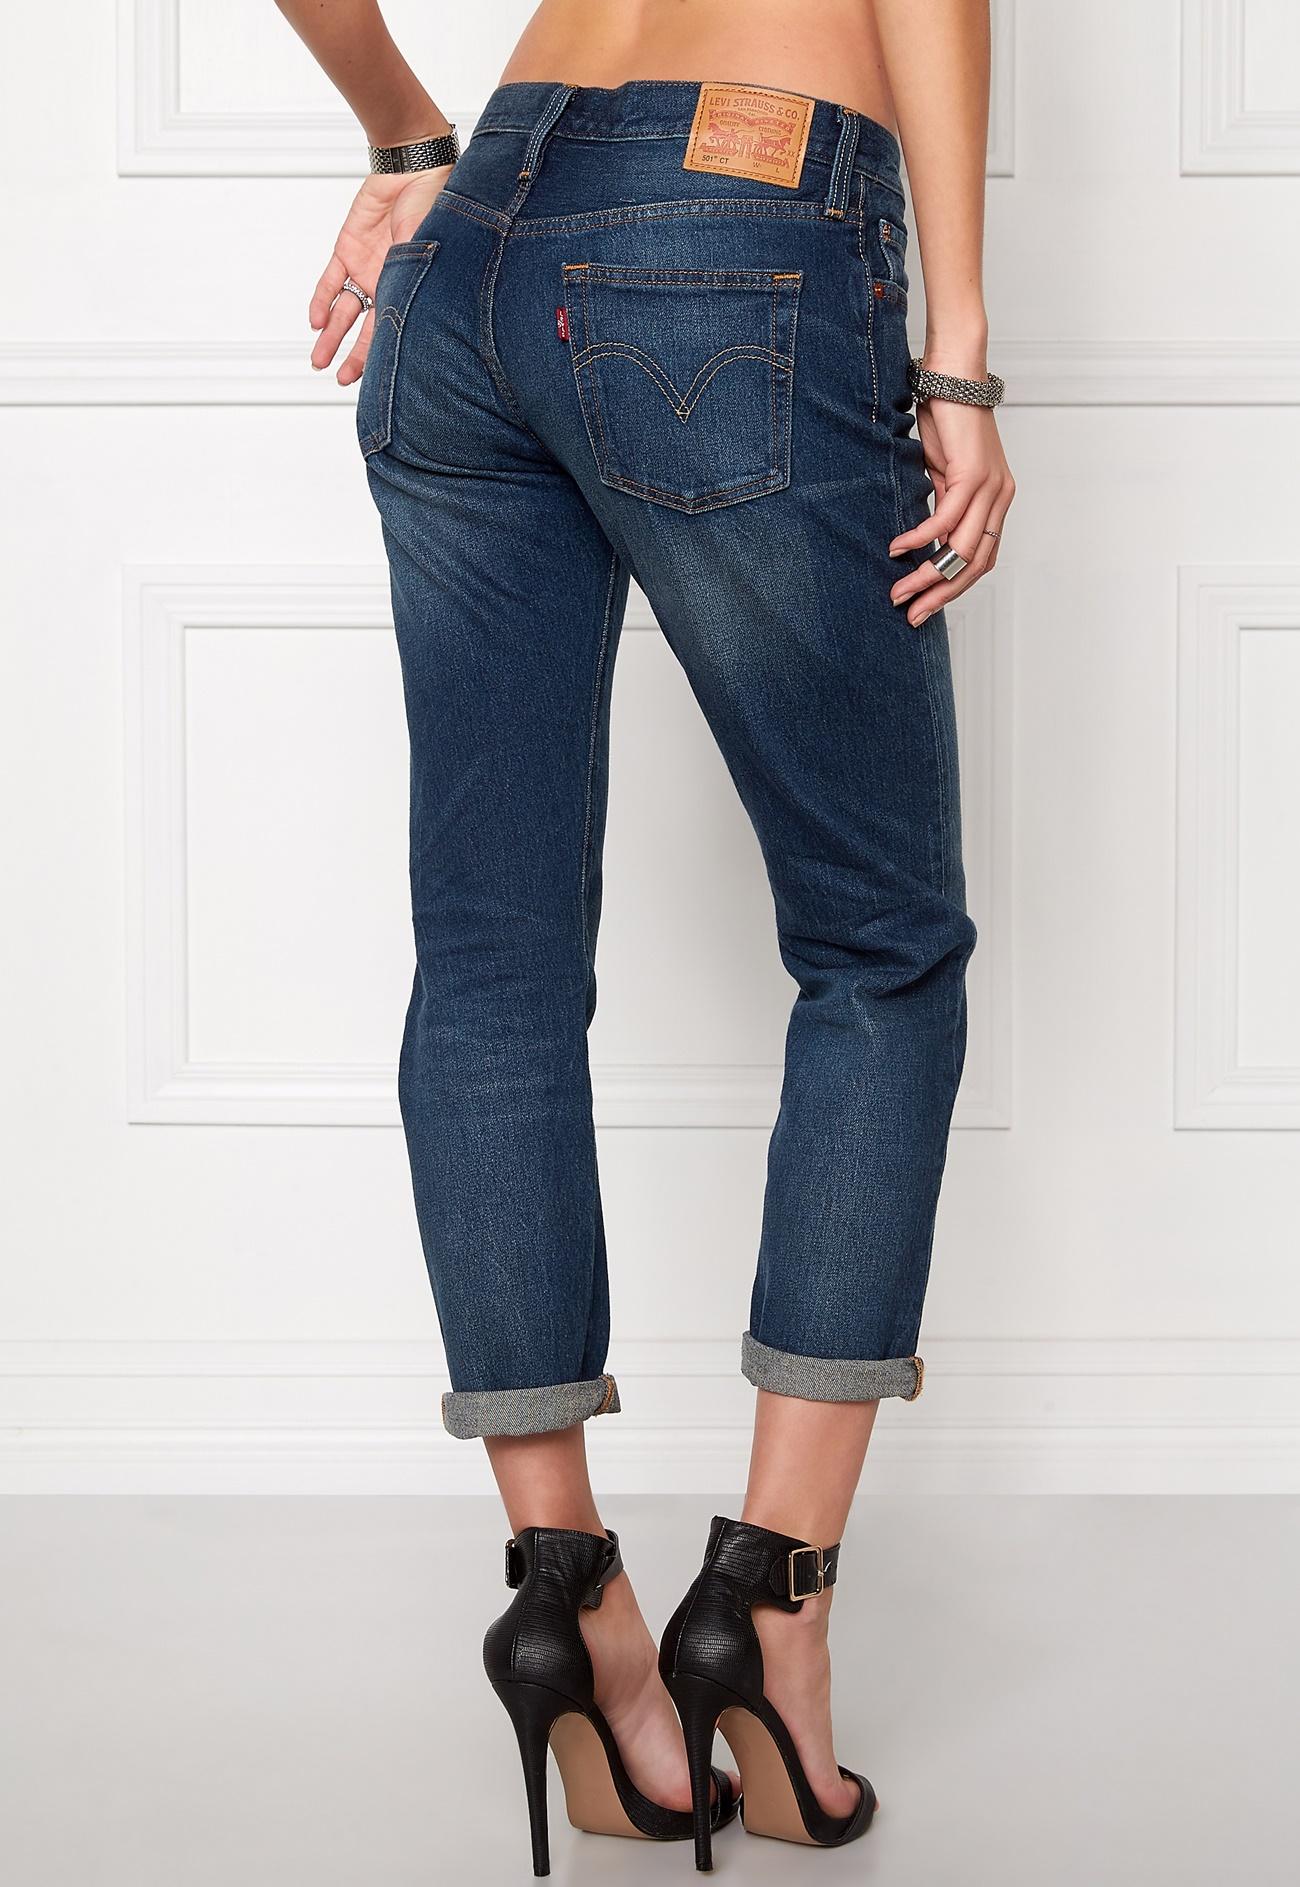 levi 39 s 501 ct jeans 0058 roasted indigo bubbleroom. Black Bedroom Furniture Sets. Home Design Ideas